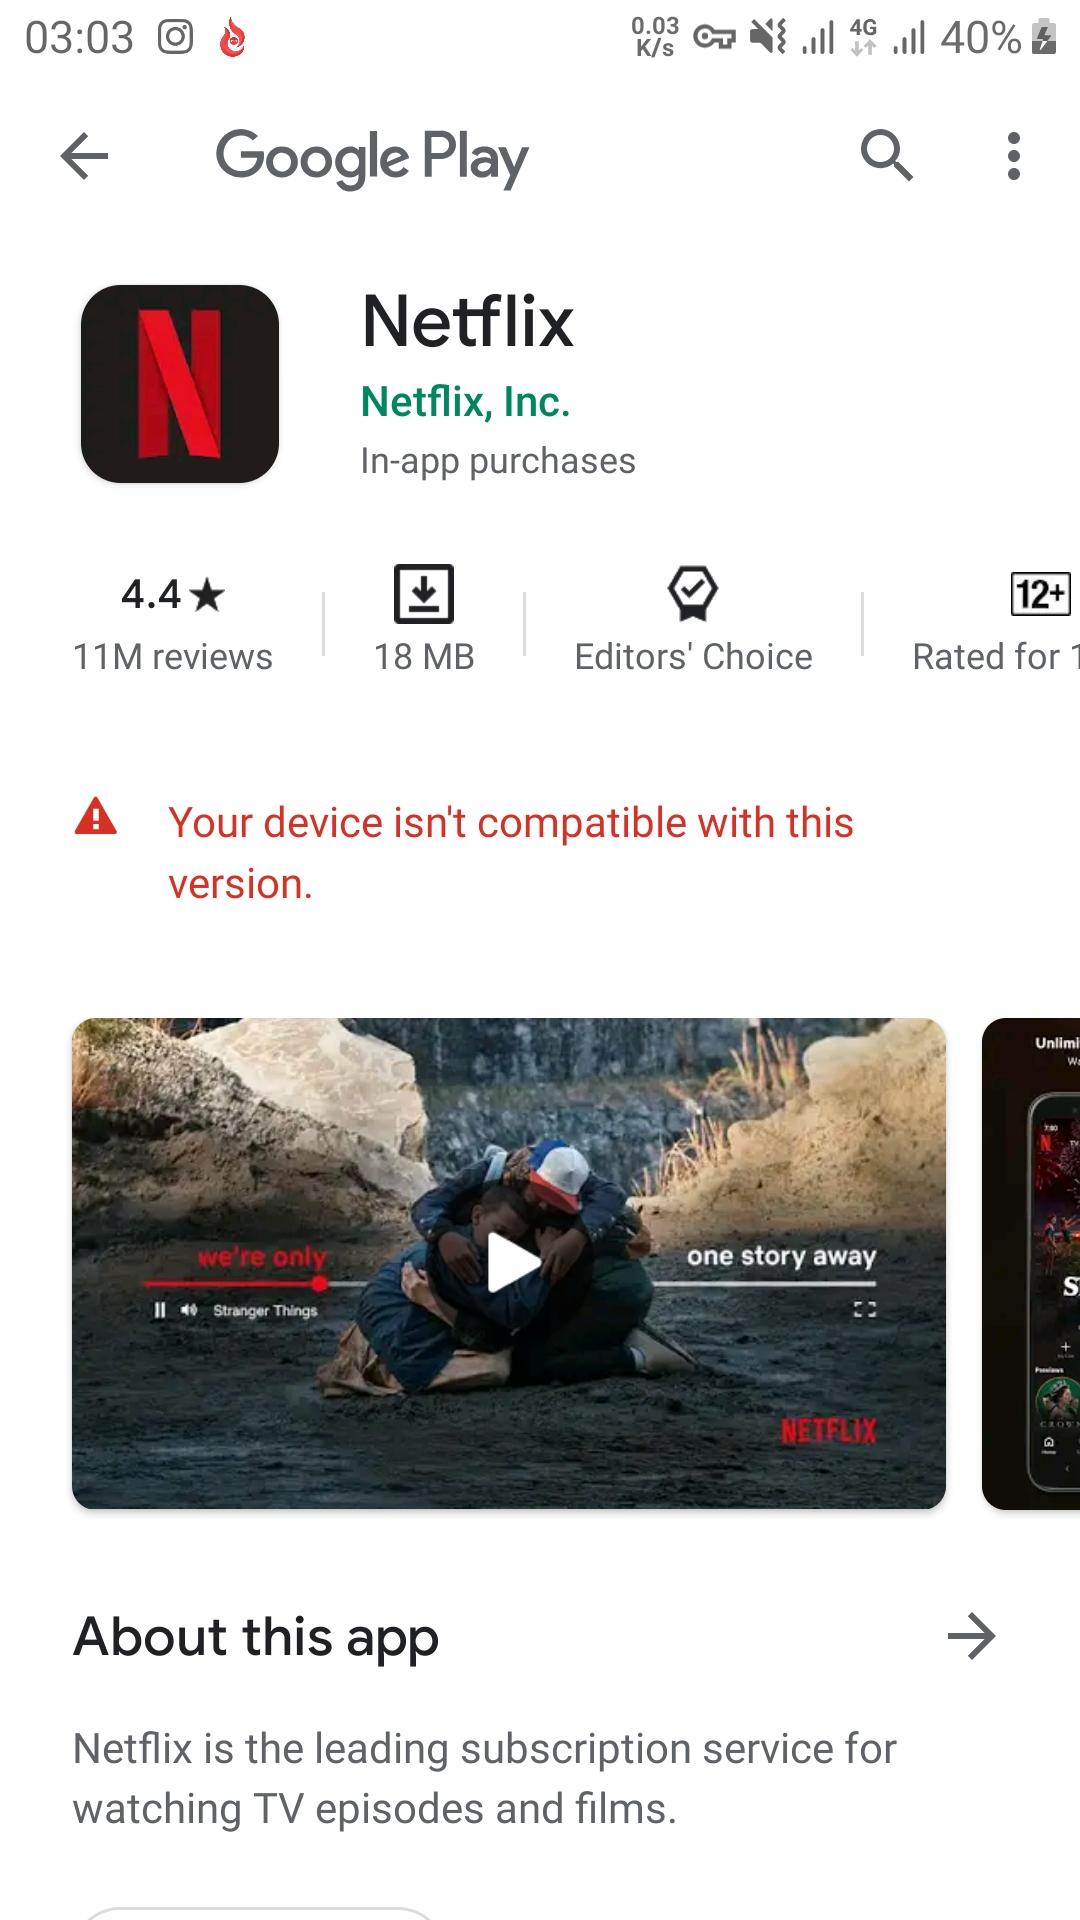 Screenshot_20210517-030301_Google Play Store.jpg